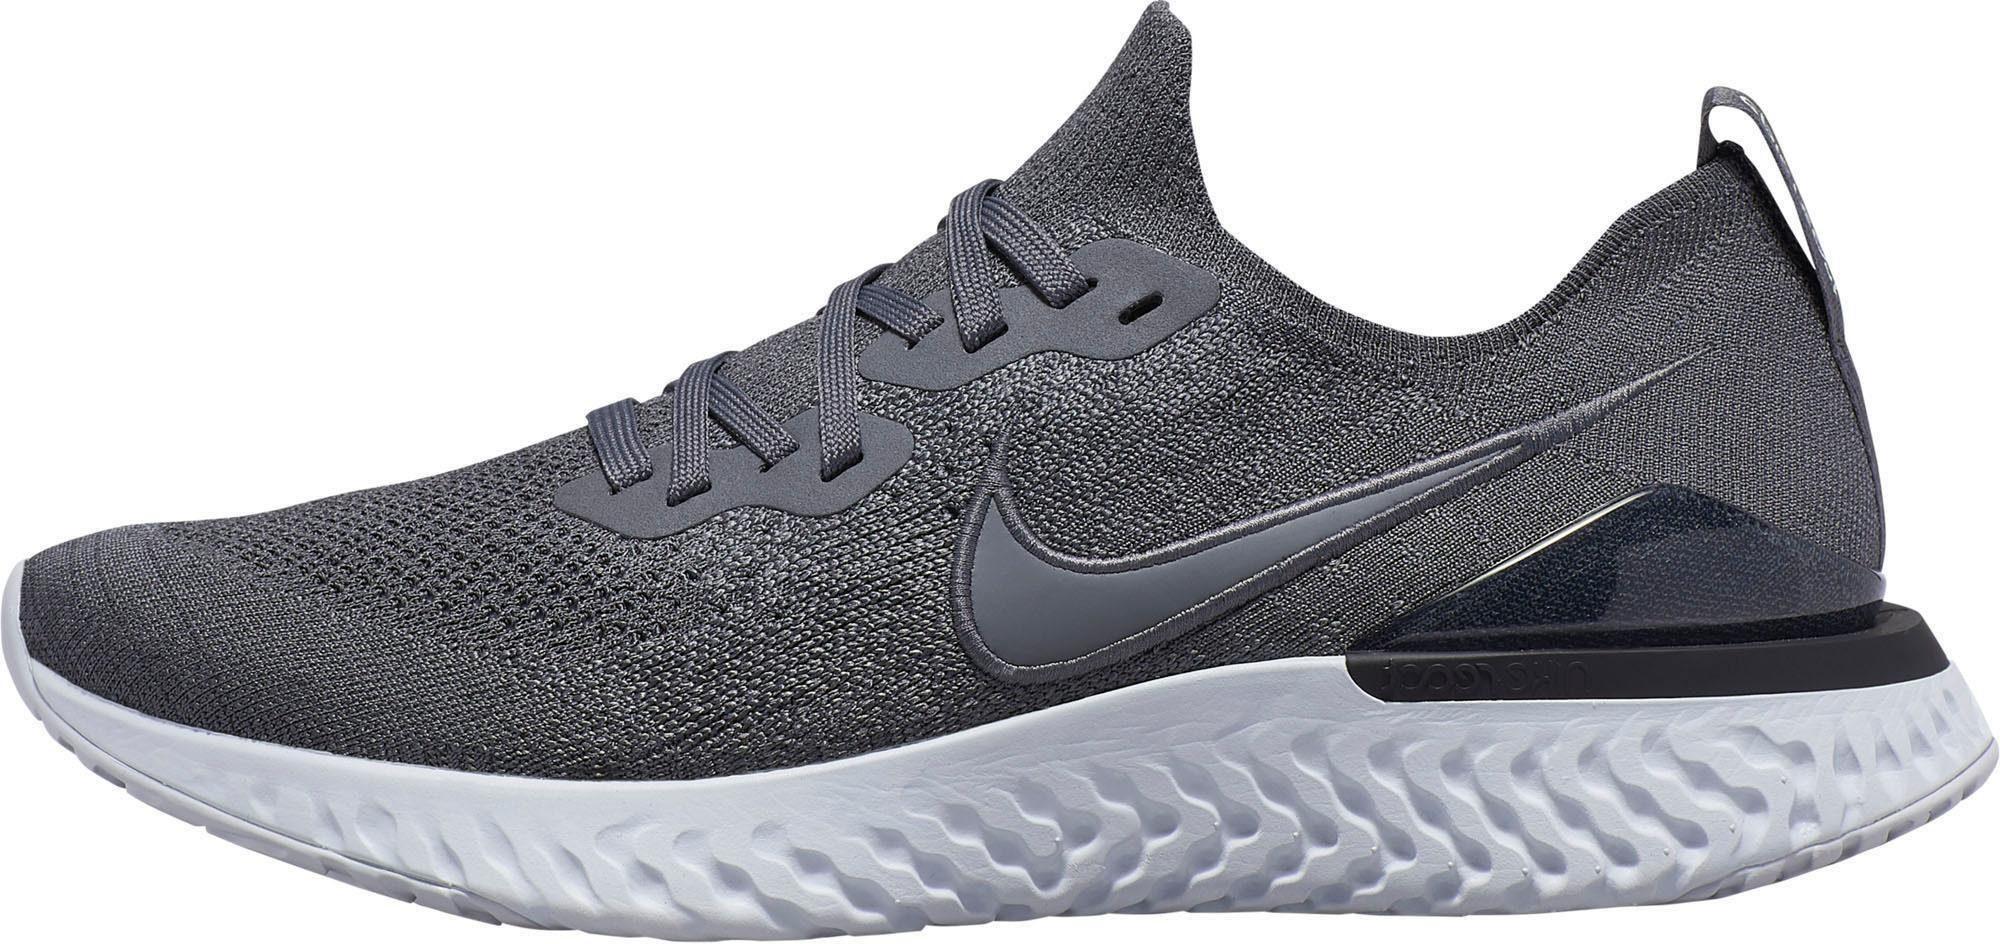 Nike »Epic React Flyknit 2« Laufschuh kaufen   OTTO